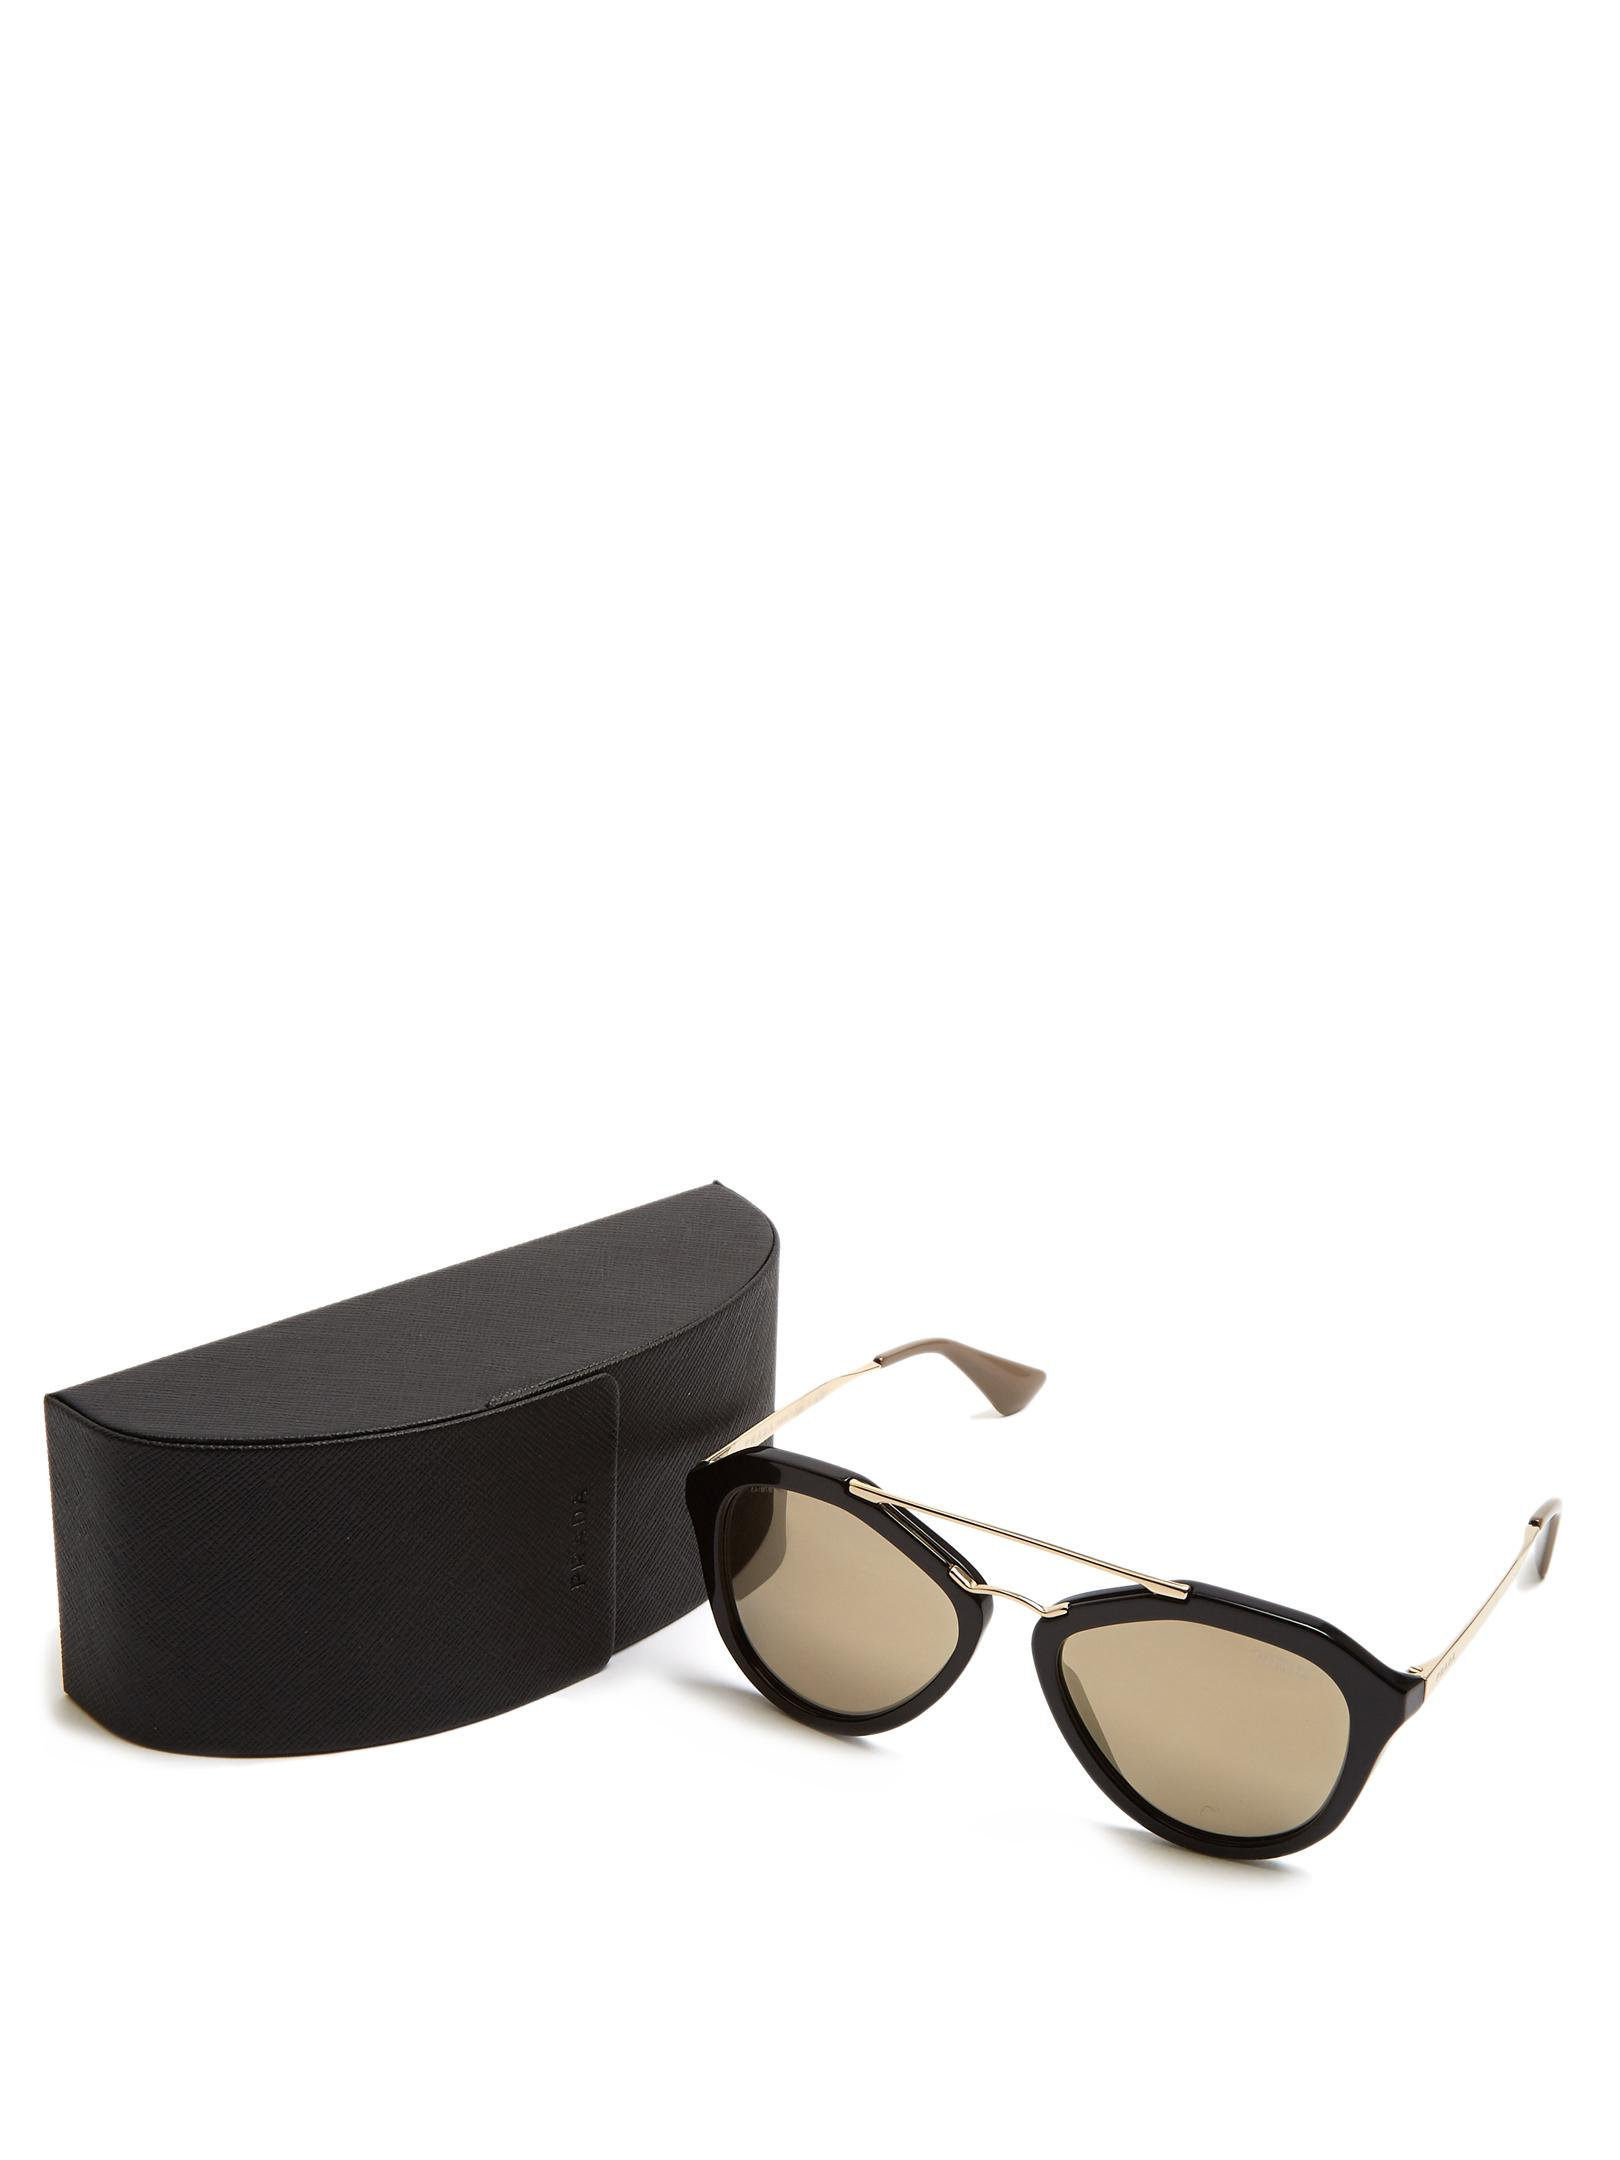 Prada Aviator Acetate Sunglasses in Black